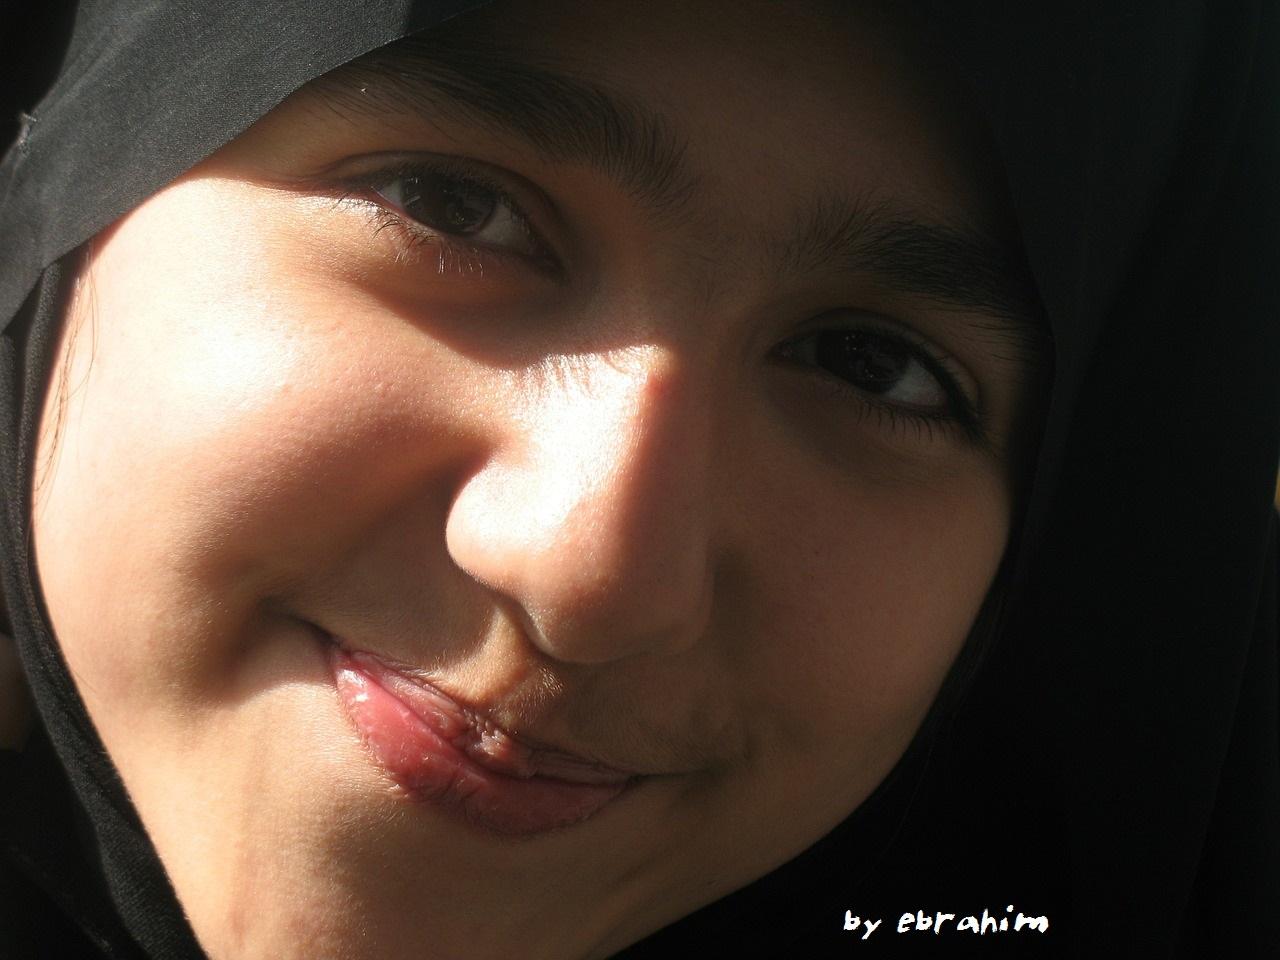 by ebrahim-girl-403178_1280